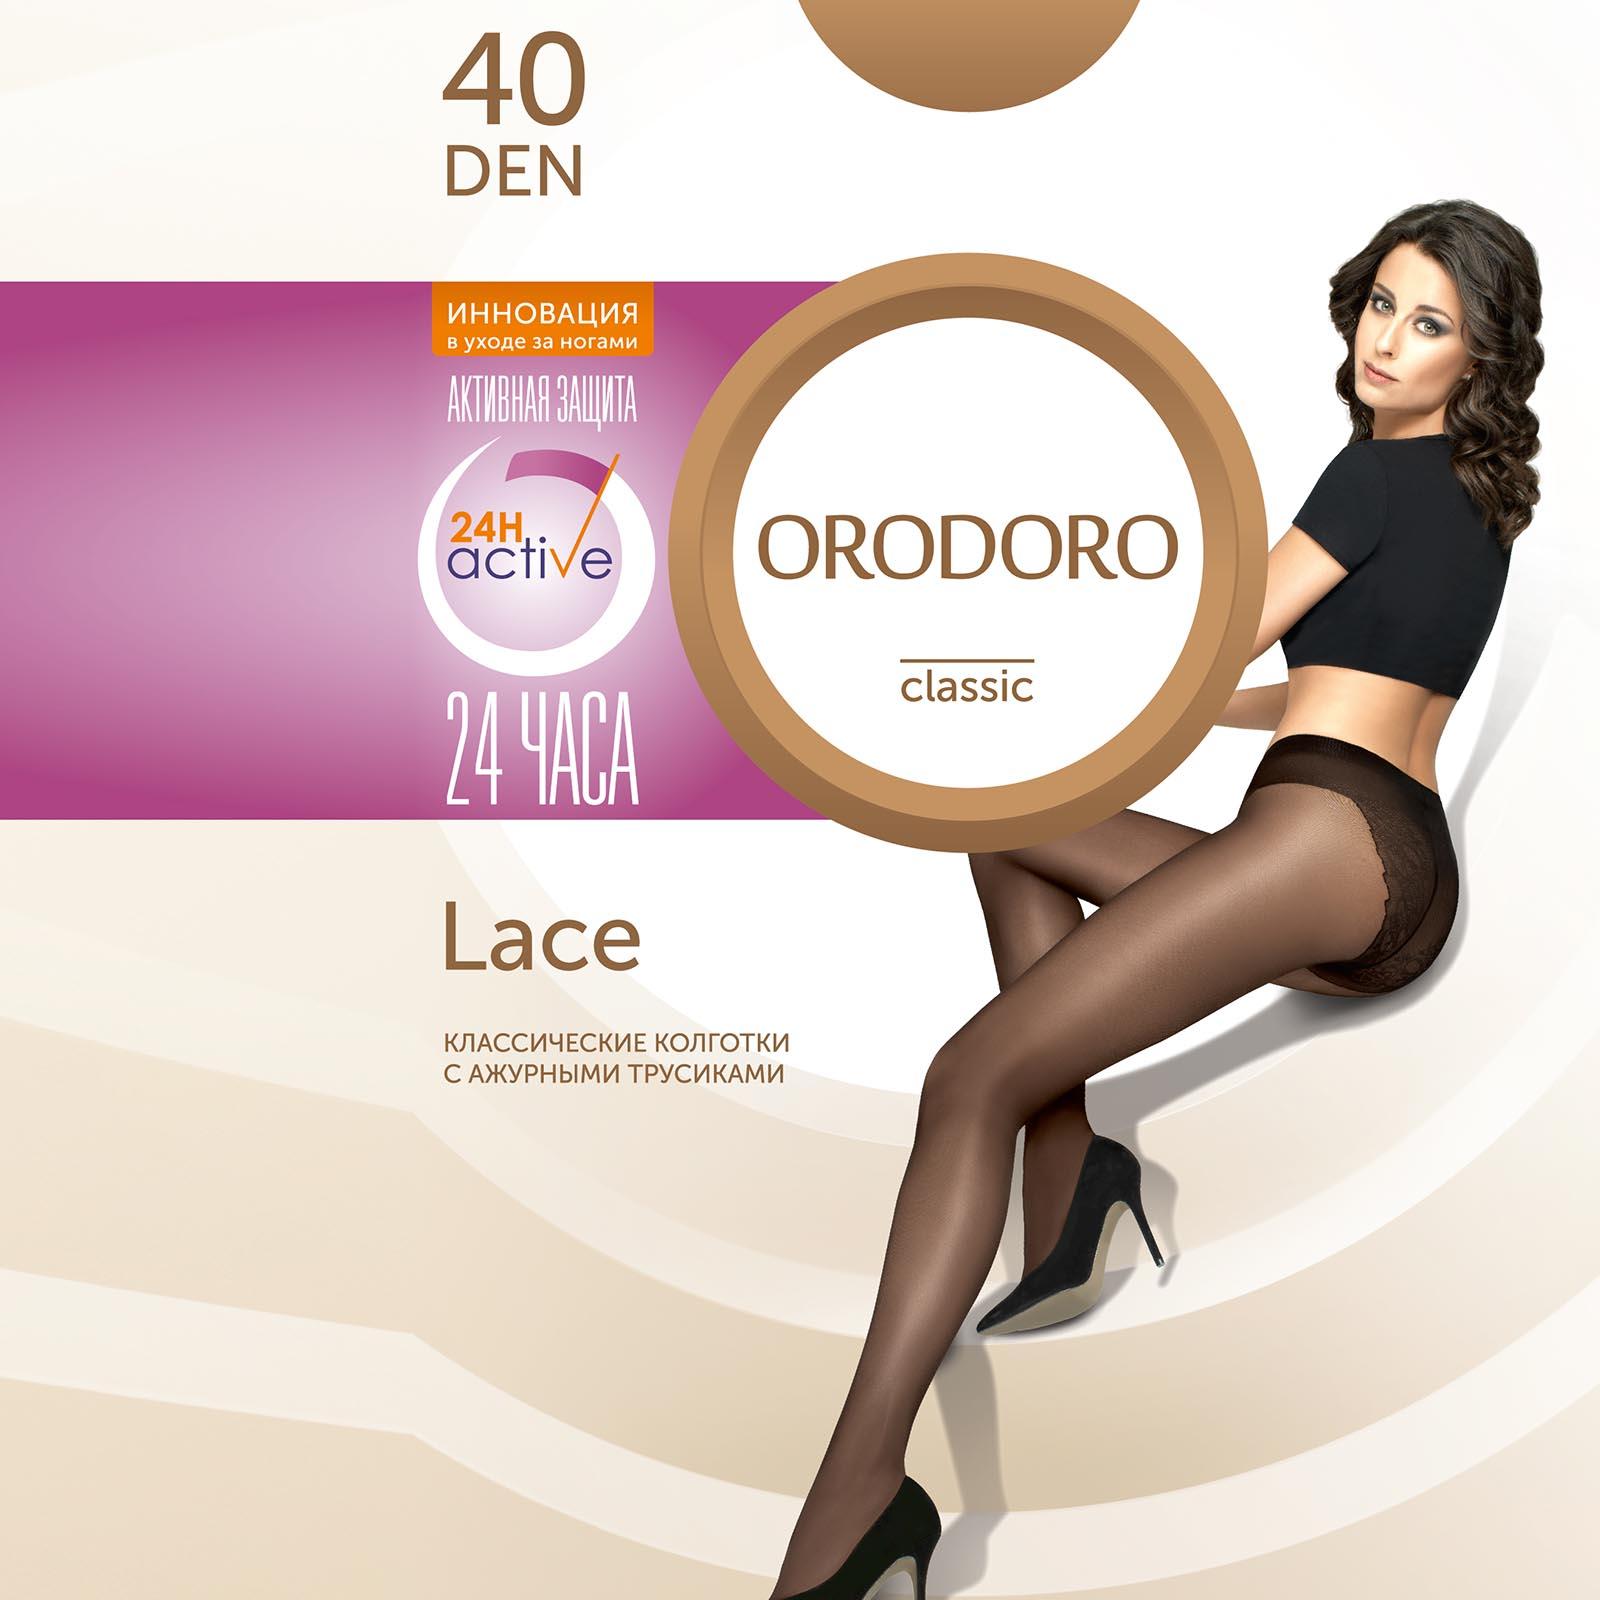 �������� �������� ��������� ������ 24 ���� � �������� ��������� Orodoro 40 den